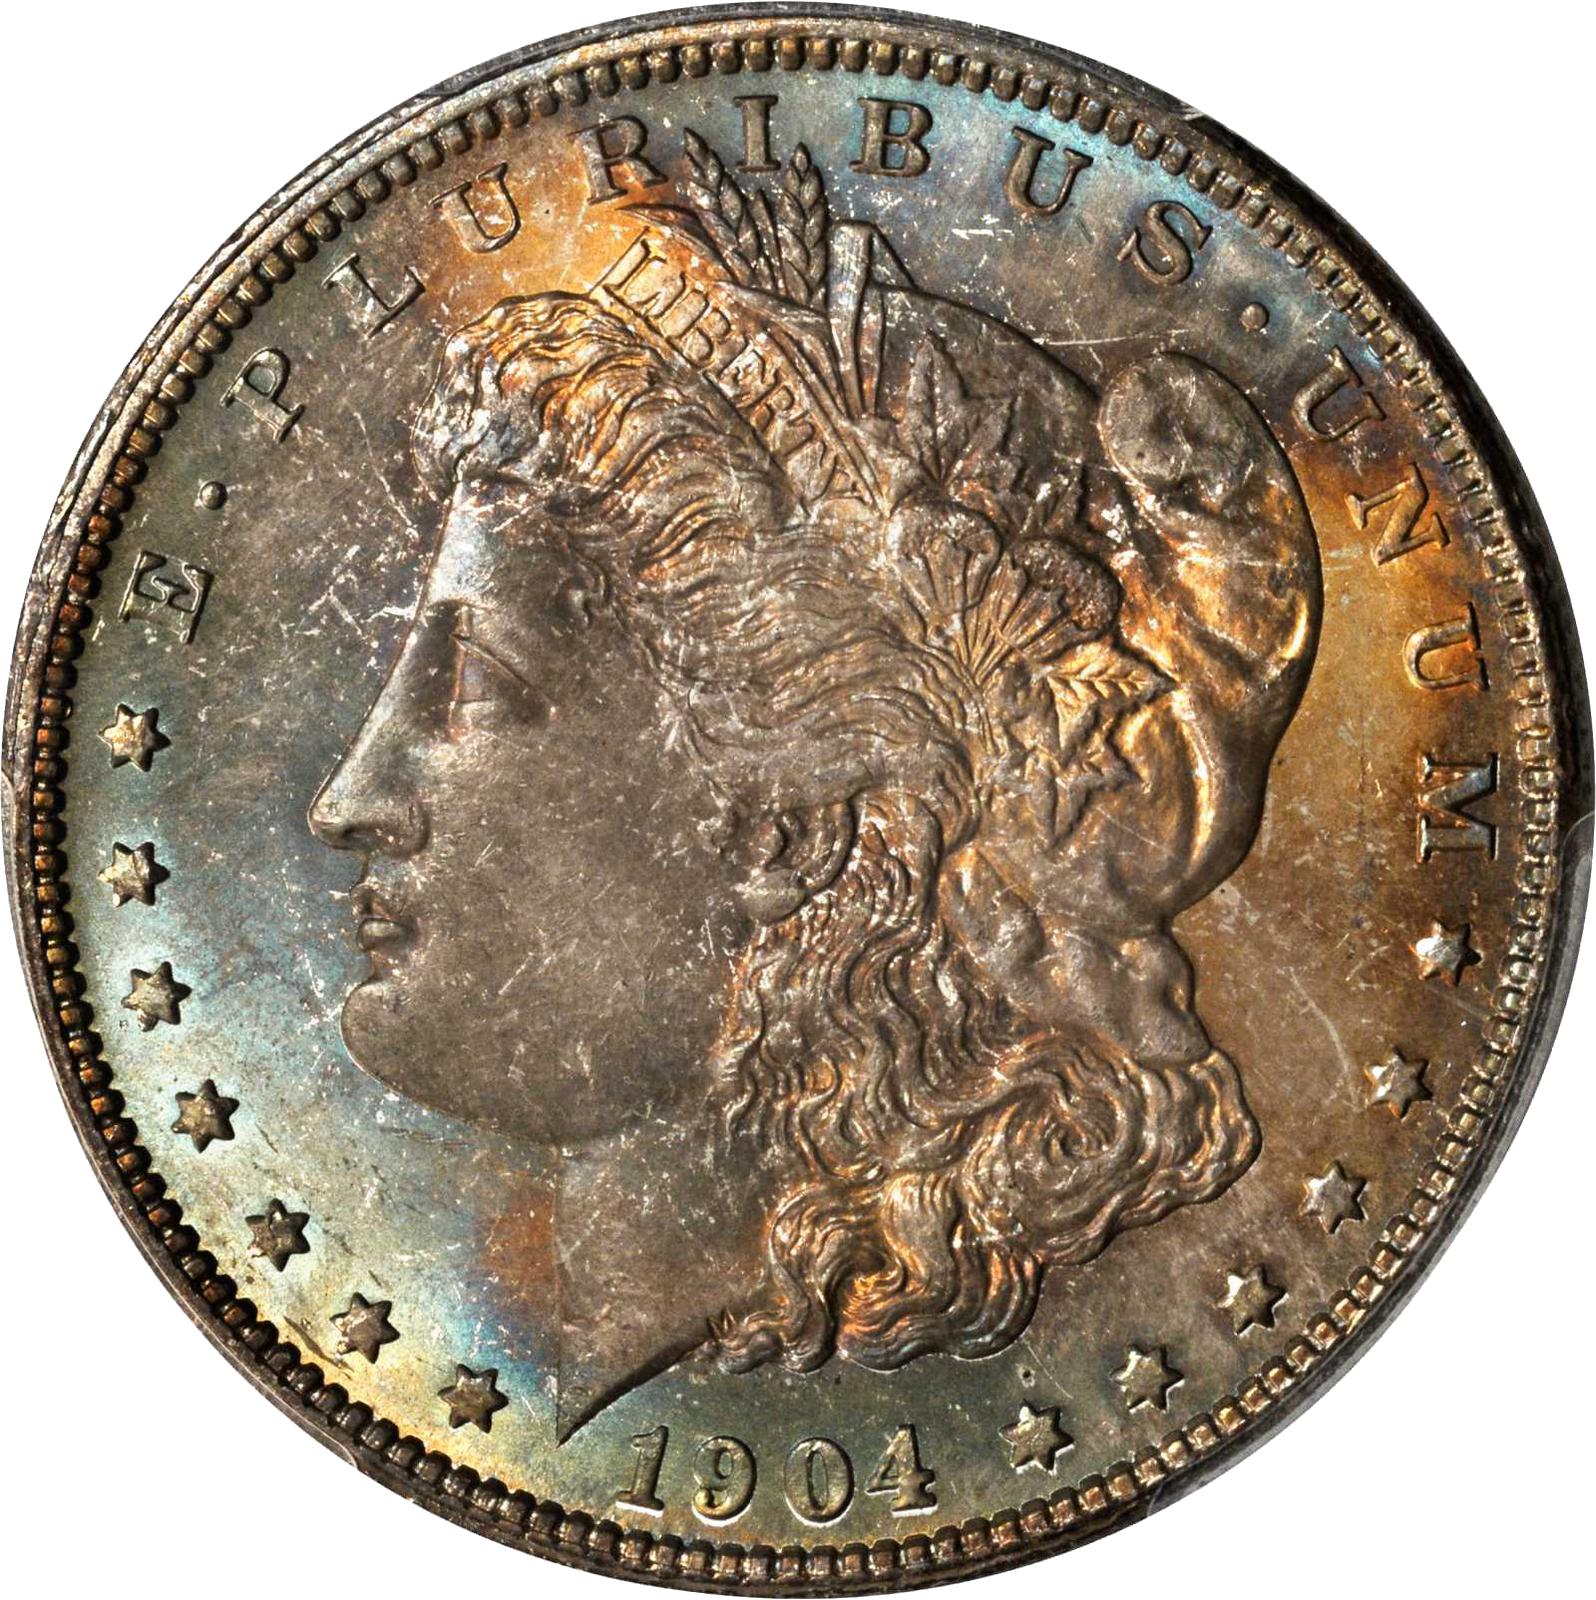 Value Of 1904 O Morgan Dollar Rare Silver Dollar Buyers